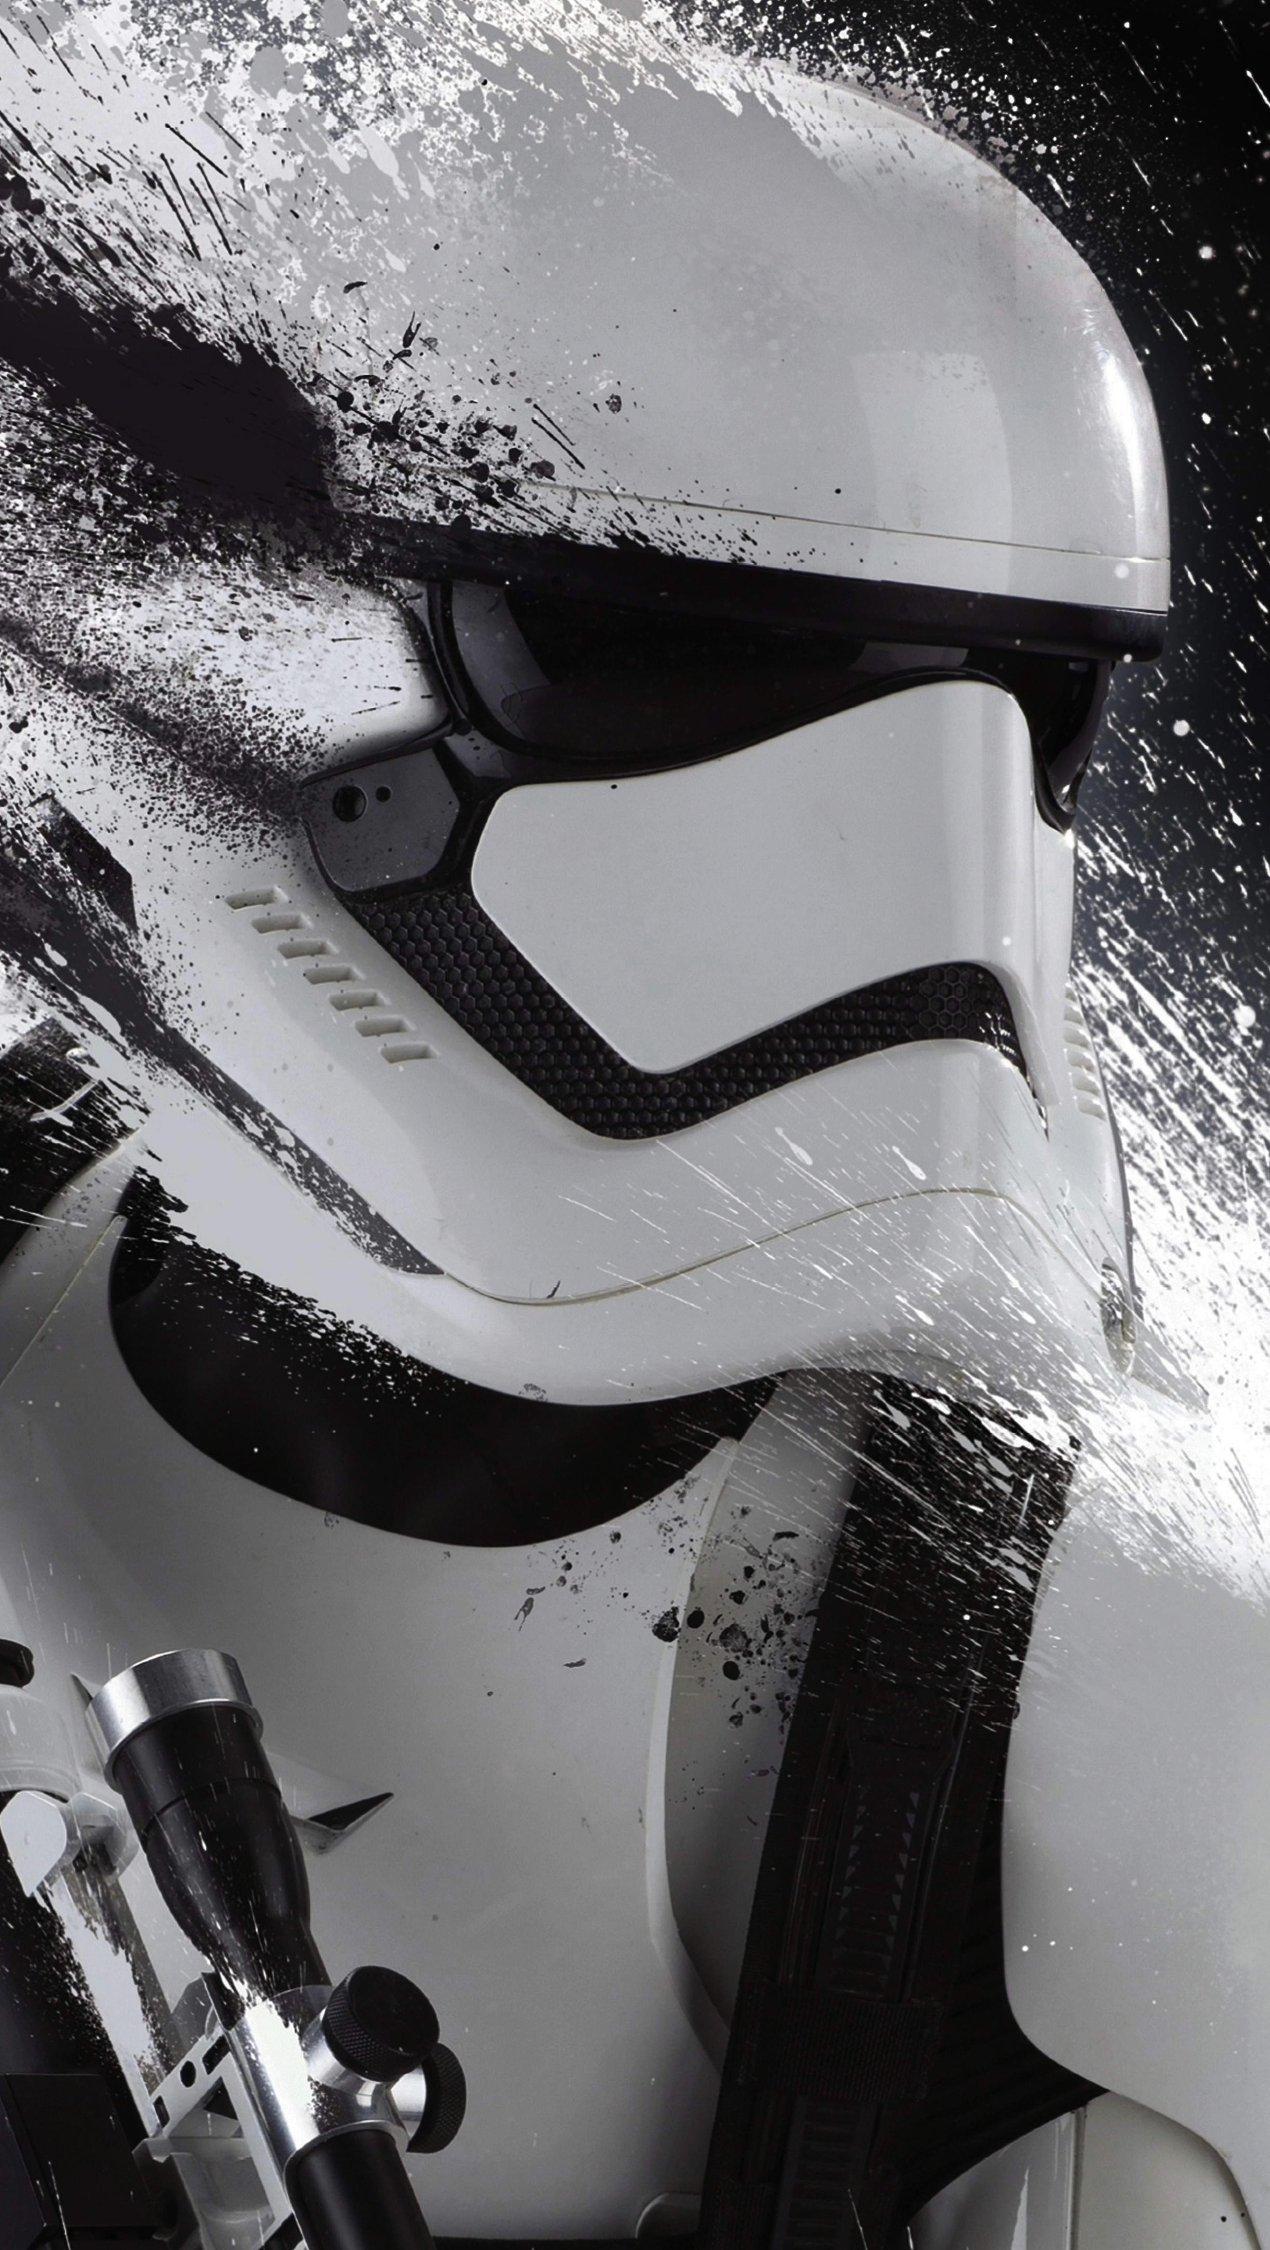 Wallpaper Stormtrooper Star Wars Vertical